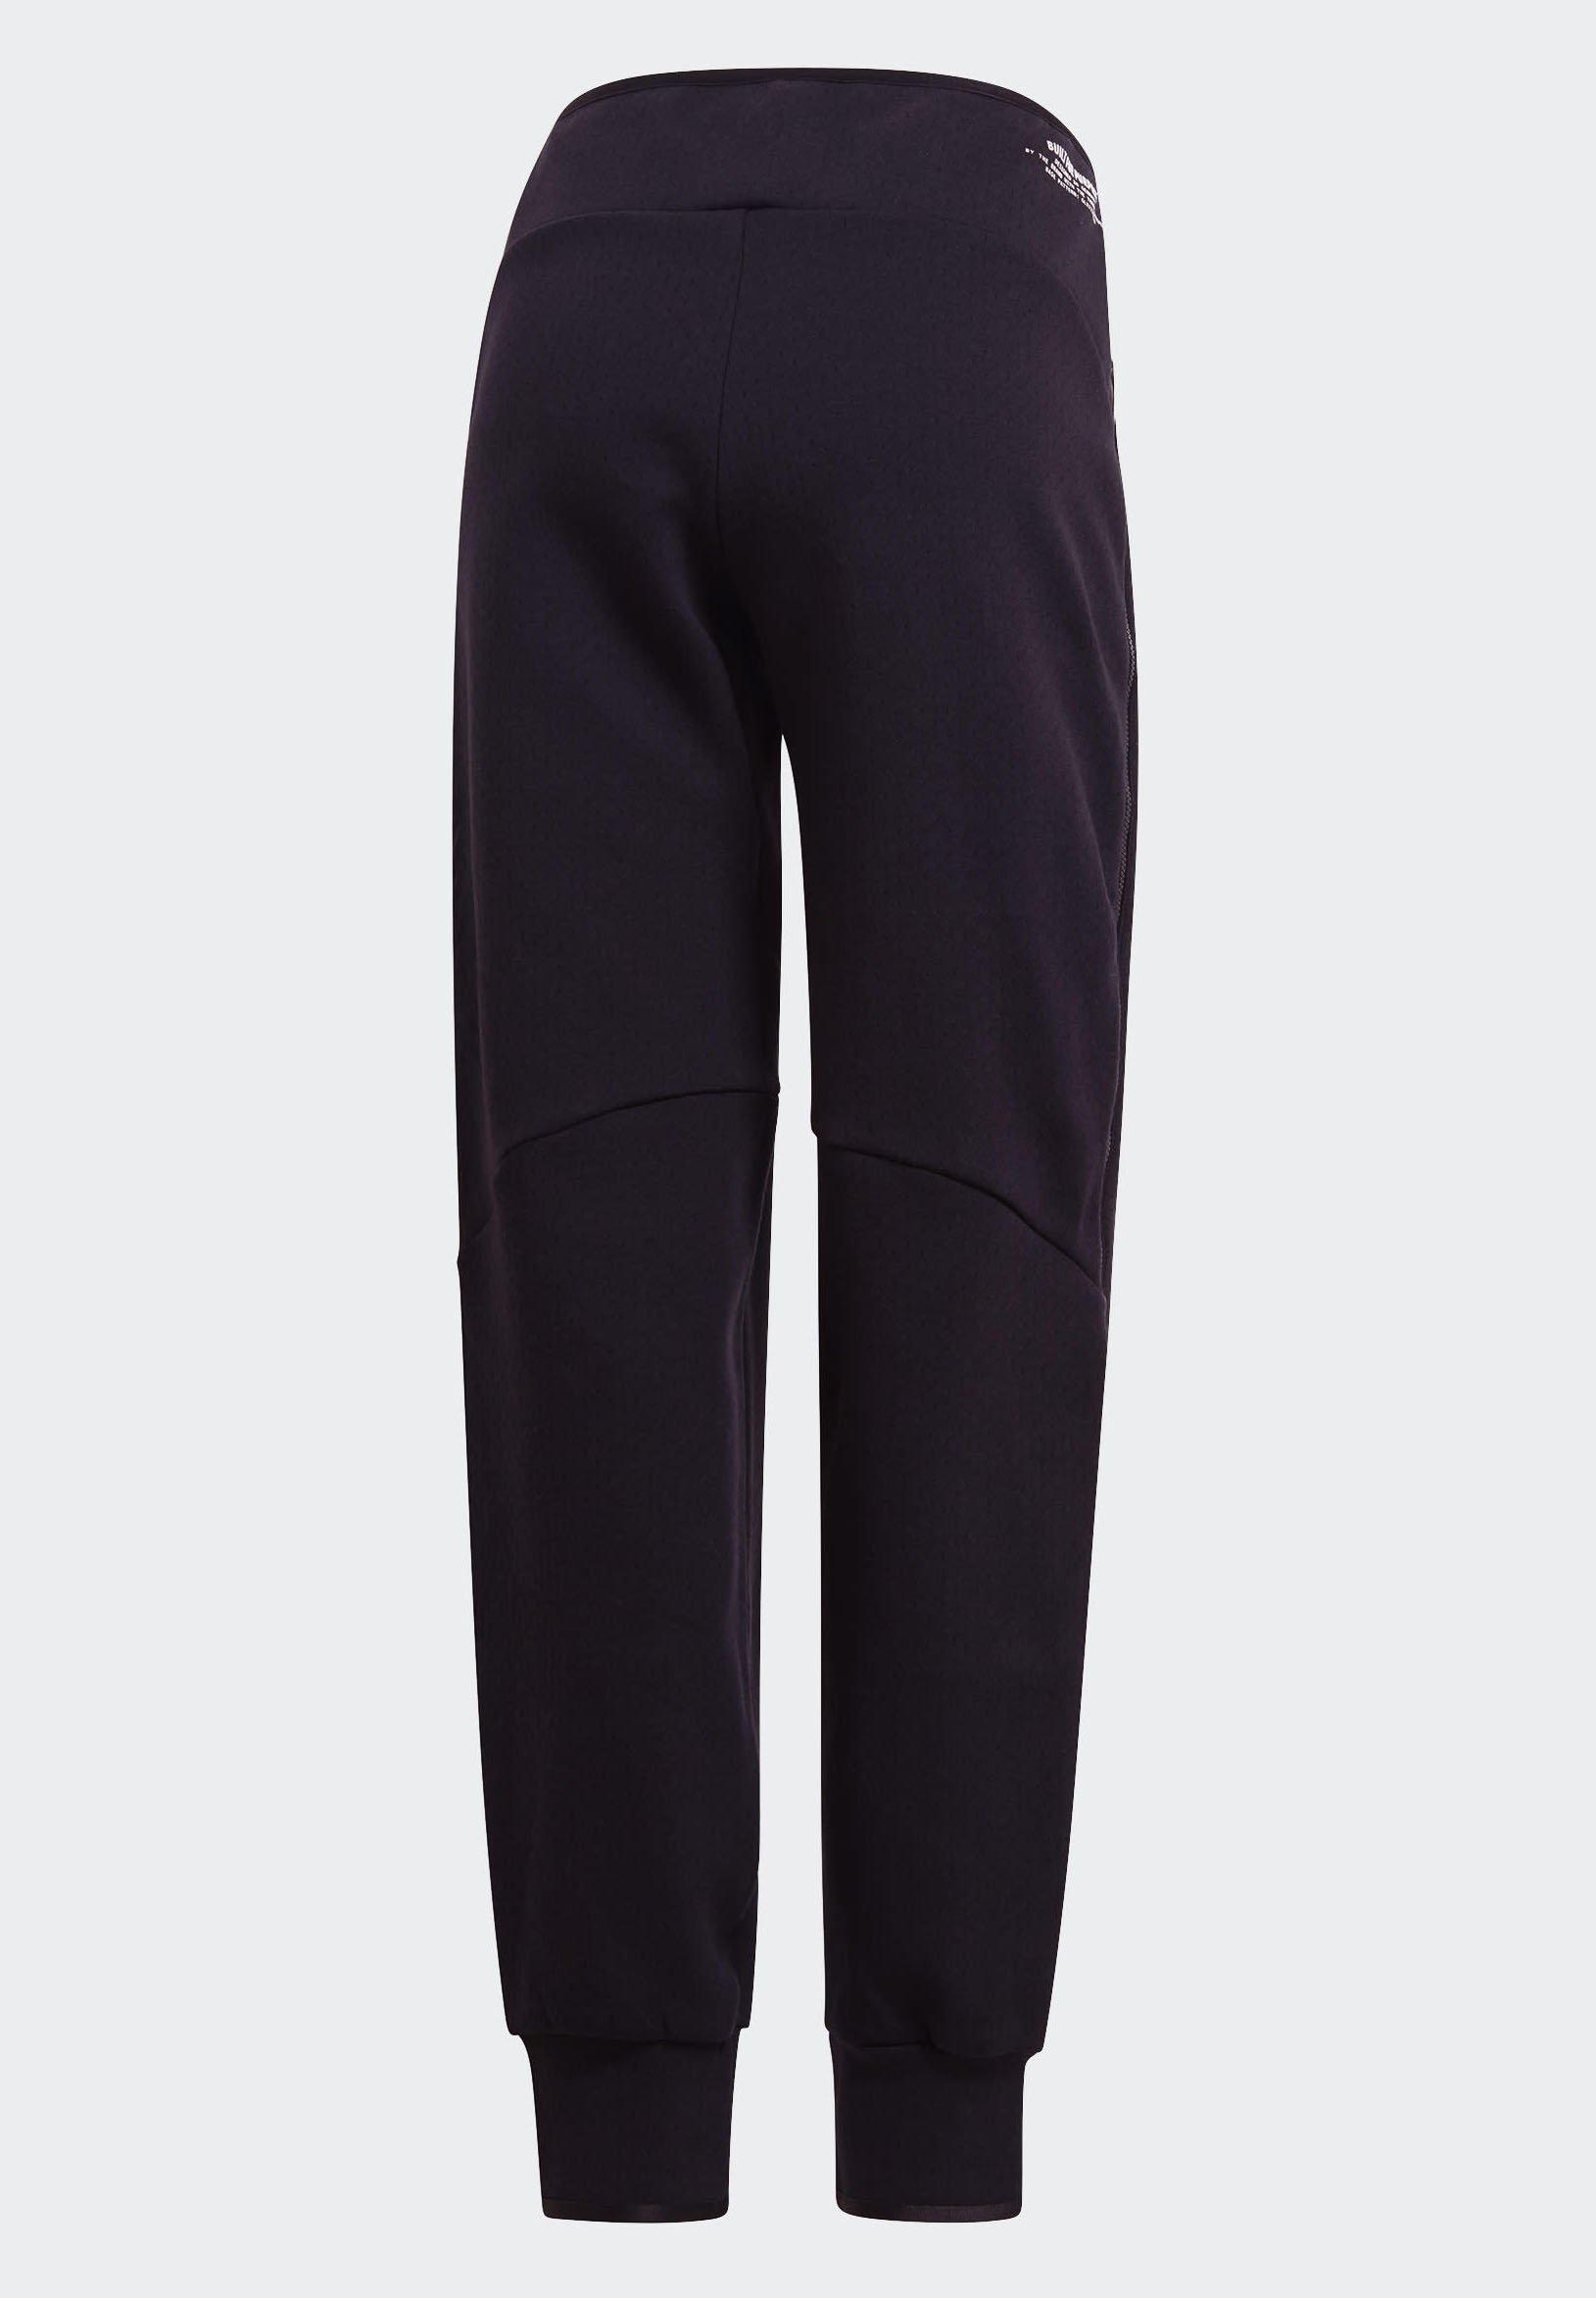 Femme Z.N.E. pnt SPORTSWEAR PRIMEGREEN SPORTS REGULAR PANTS - Pantalon de survêtement